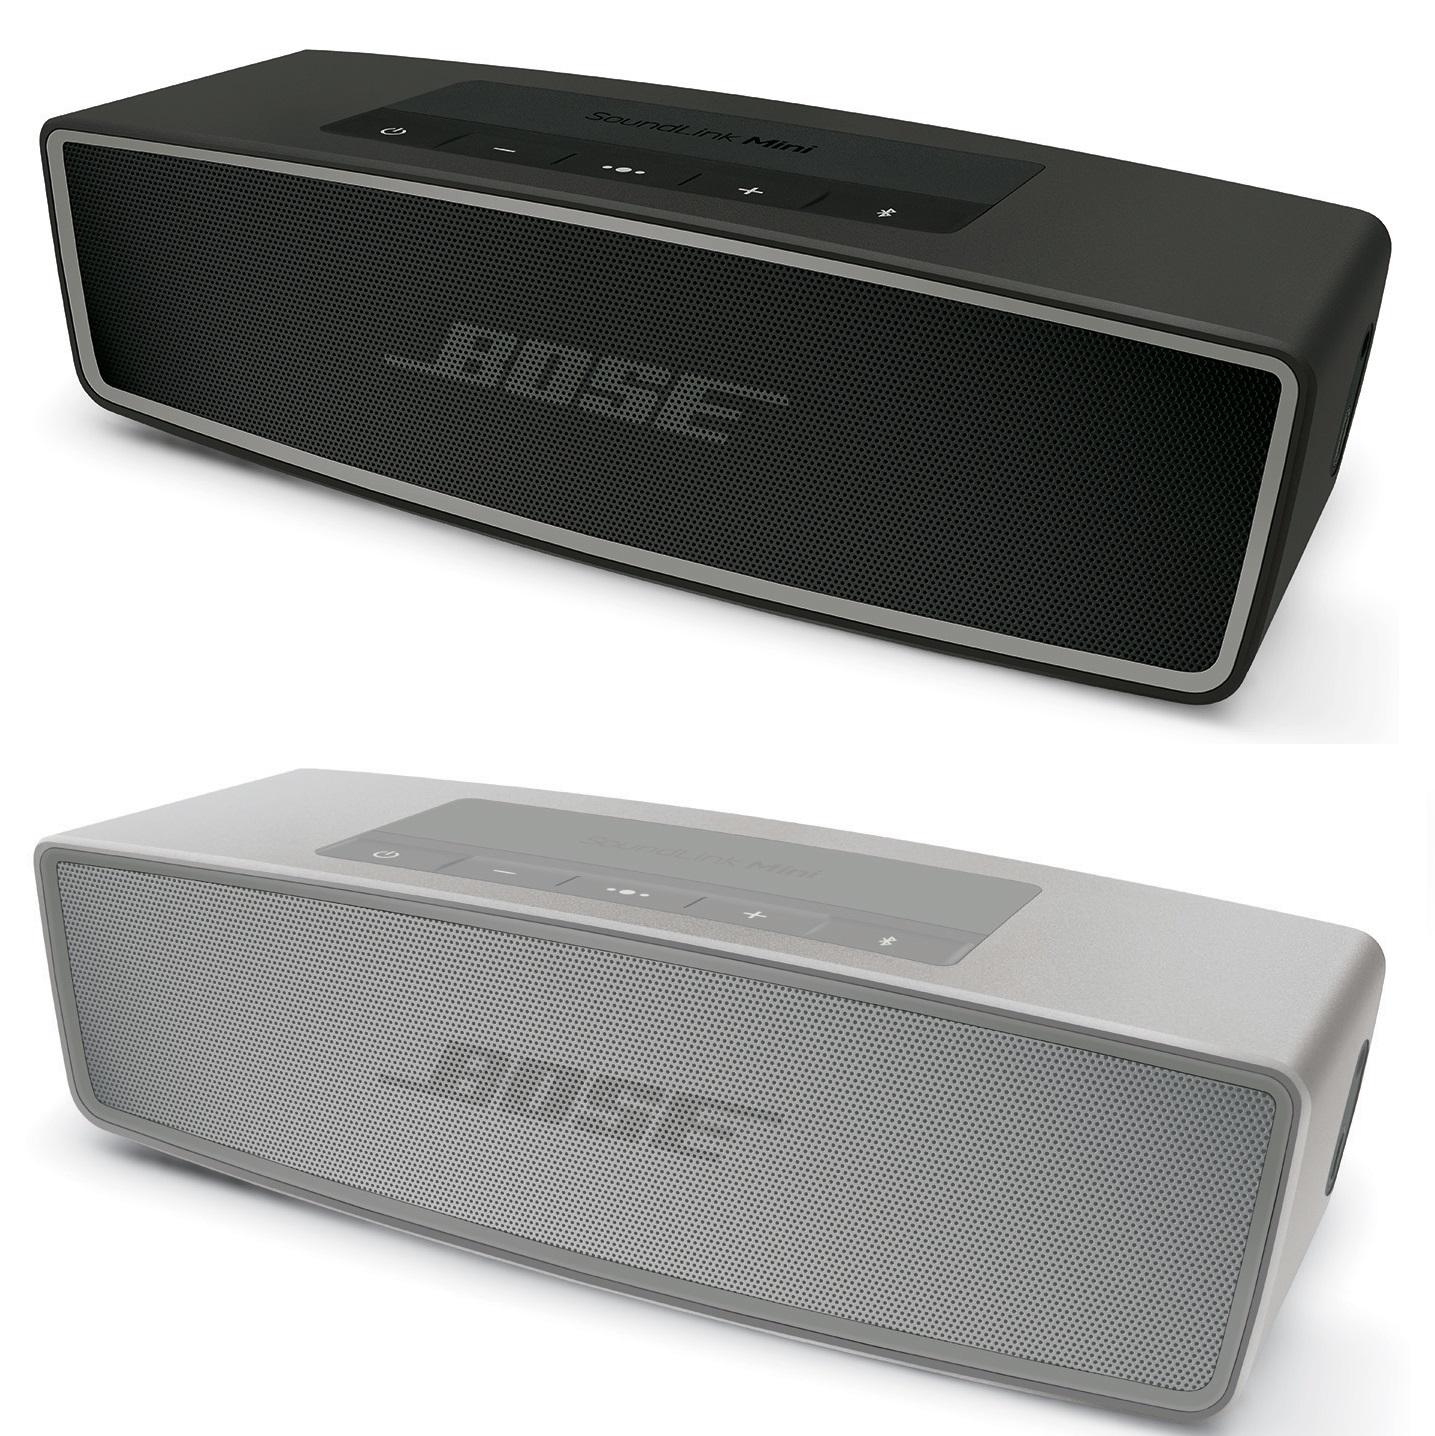 bose announces bluetooth soundlink mini speaker ii. Black Bedroom Furniture Sets. Home Design Ideas